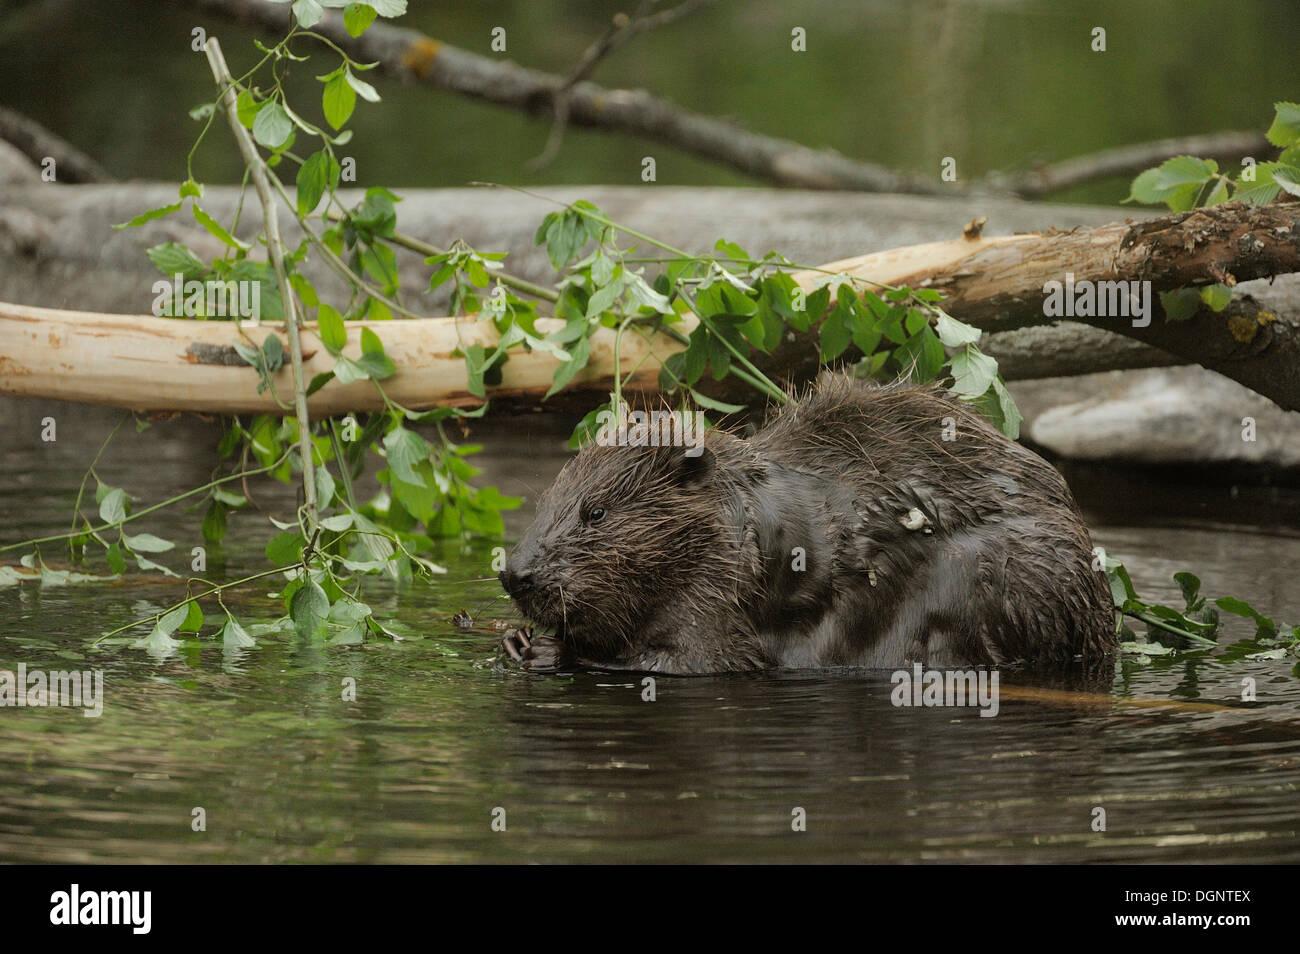 Eurasian Beaver or European Beaver (Castor fiber), Danube-Auen, Gross-Enzersdorf, Lower Austria, Austria Stock Photo